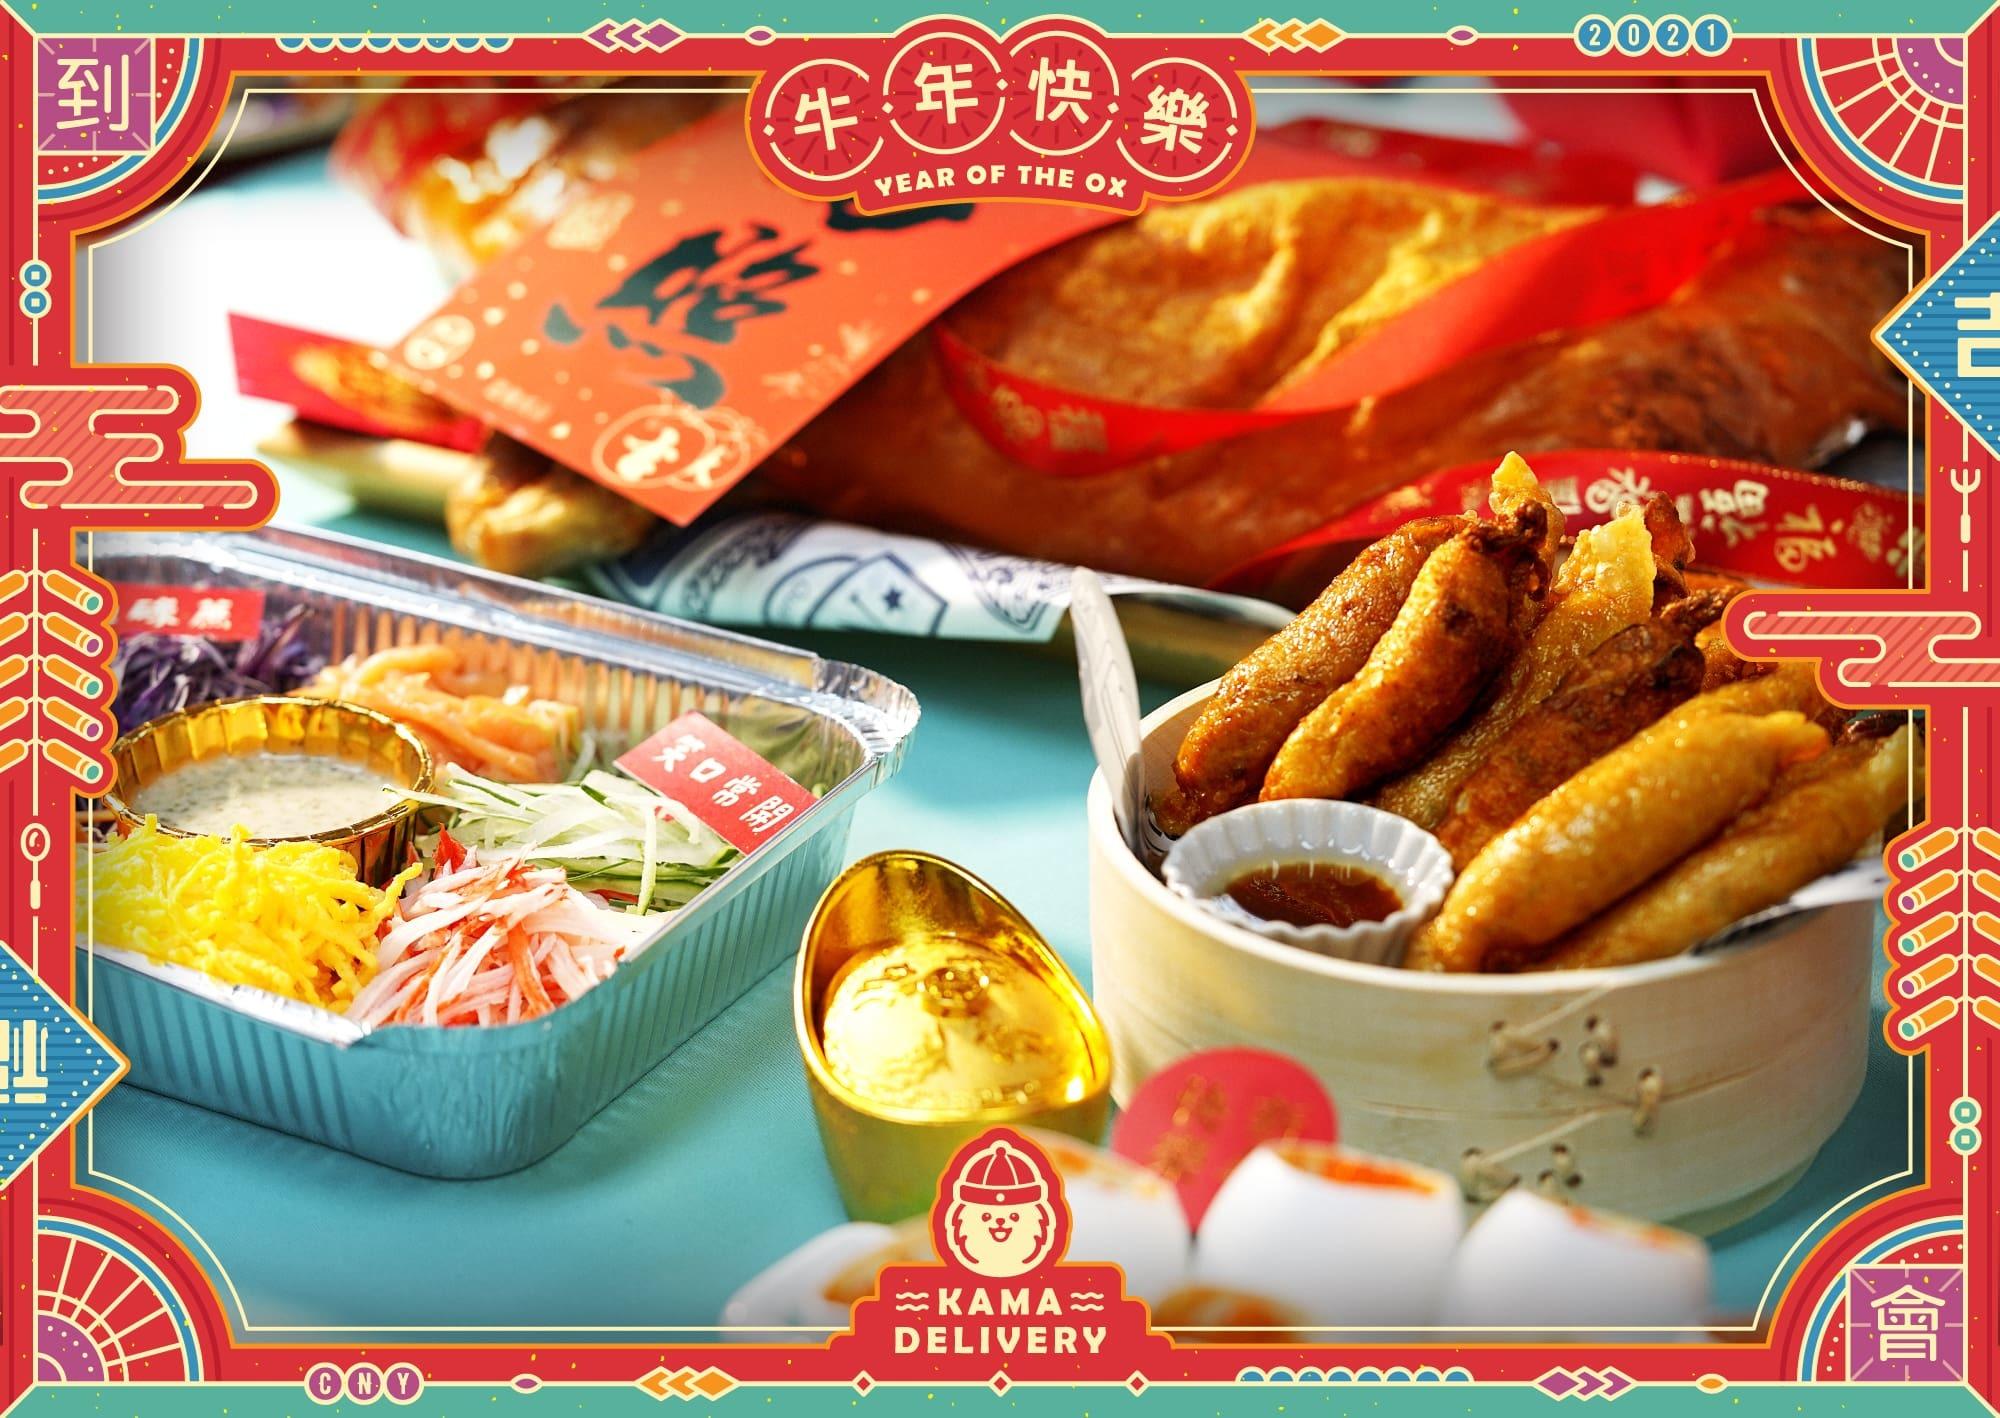 Kama Delivery提供多款年夜飯速遞套餐,主打西式及中西Fusion美食,適合於團年飯、拜年飯、春茗、開年飯、團拜、年夜飯等新年場合享用,並專享回贈購物金等各種優惠。